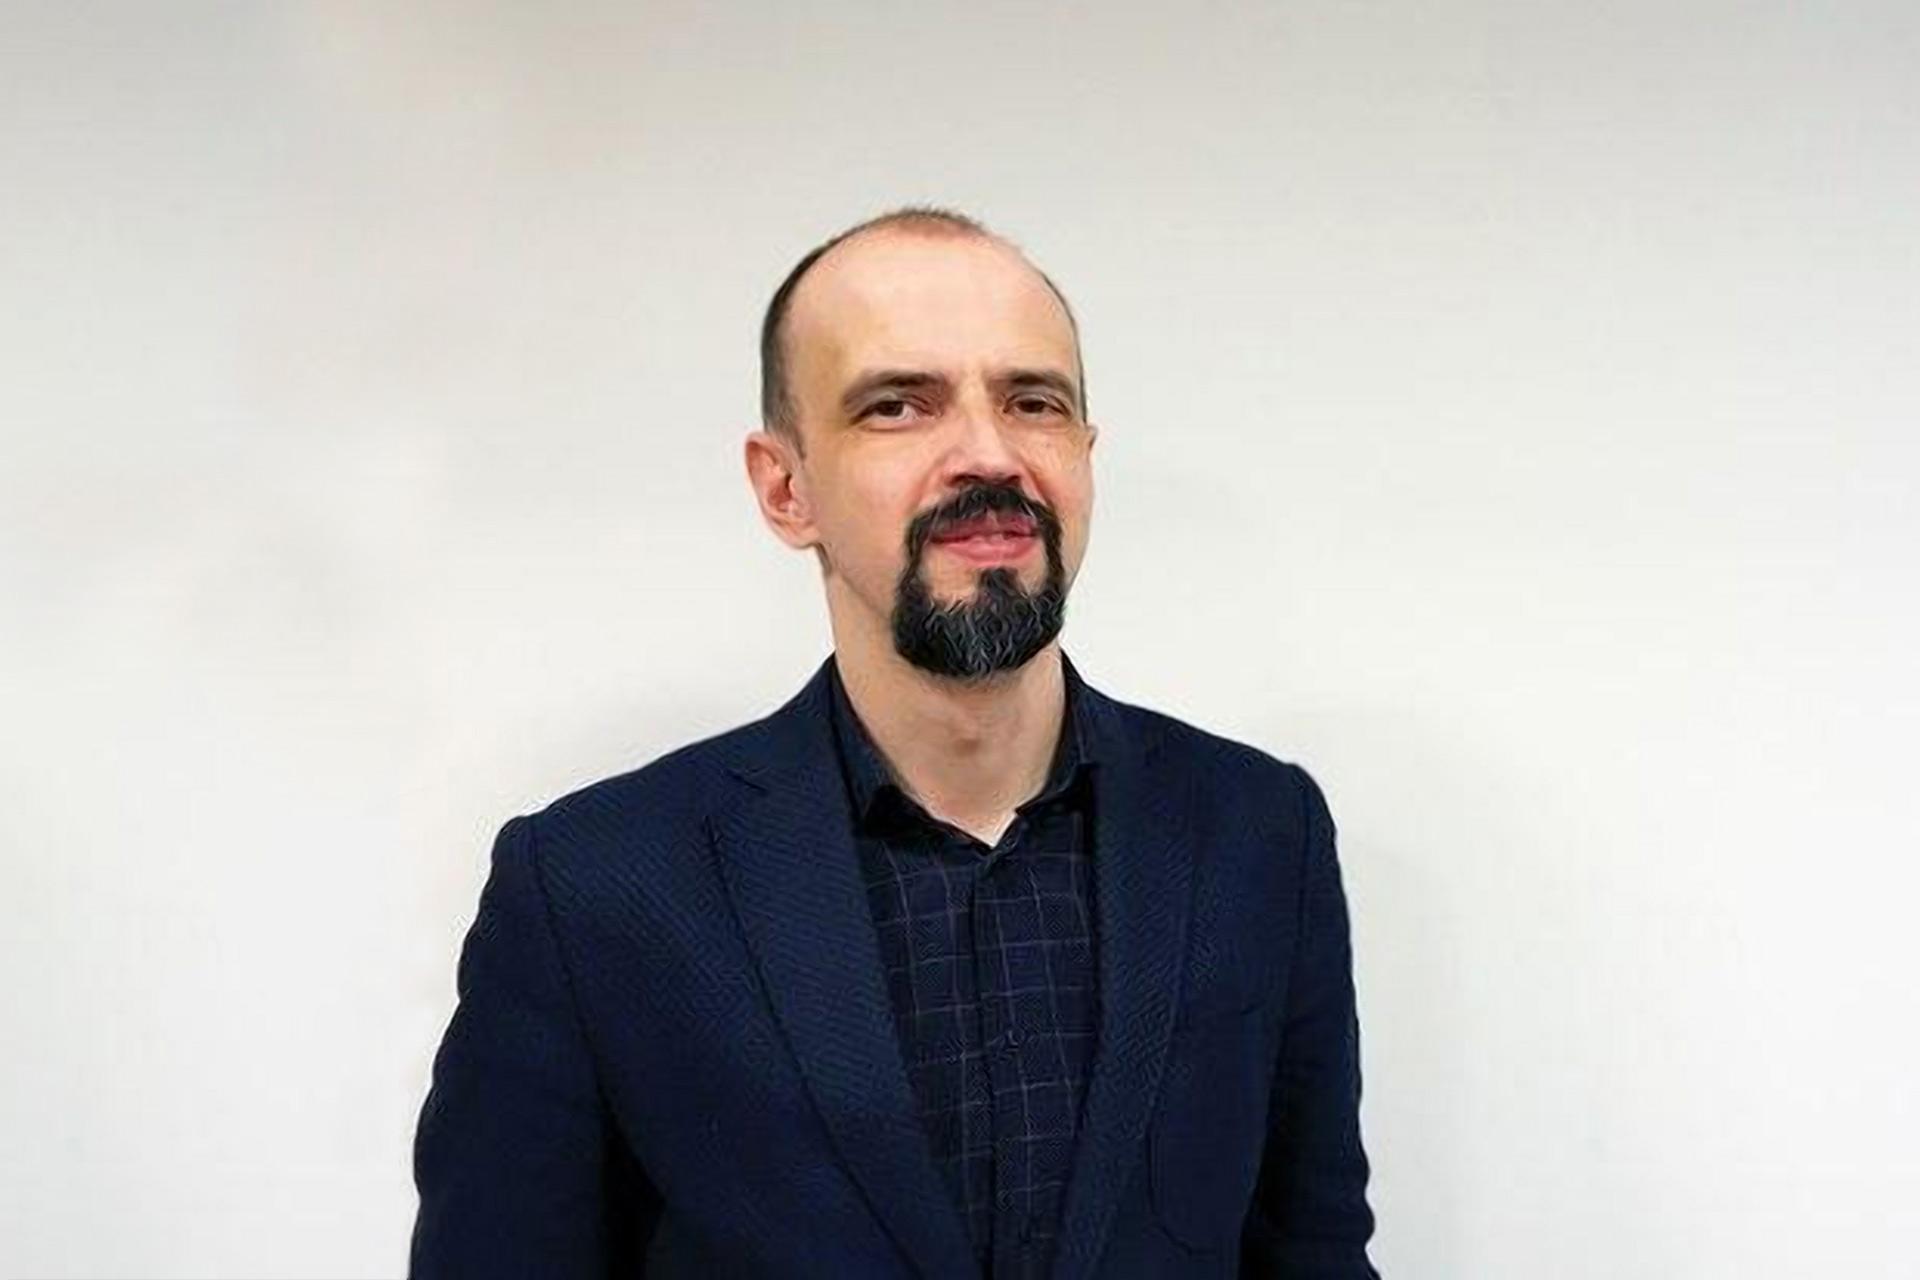 Артем Туровец, директор онлайн-бухгалтерии «Небо»